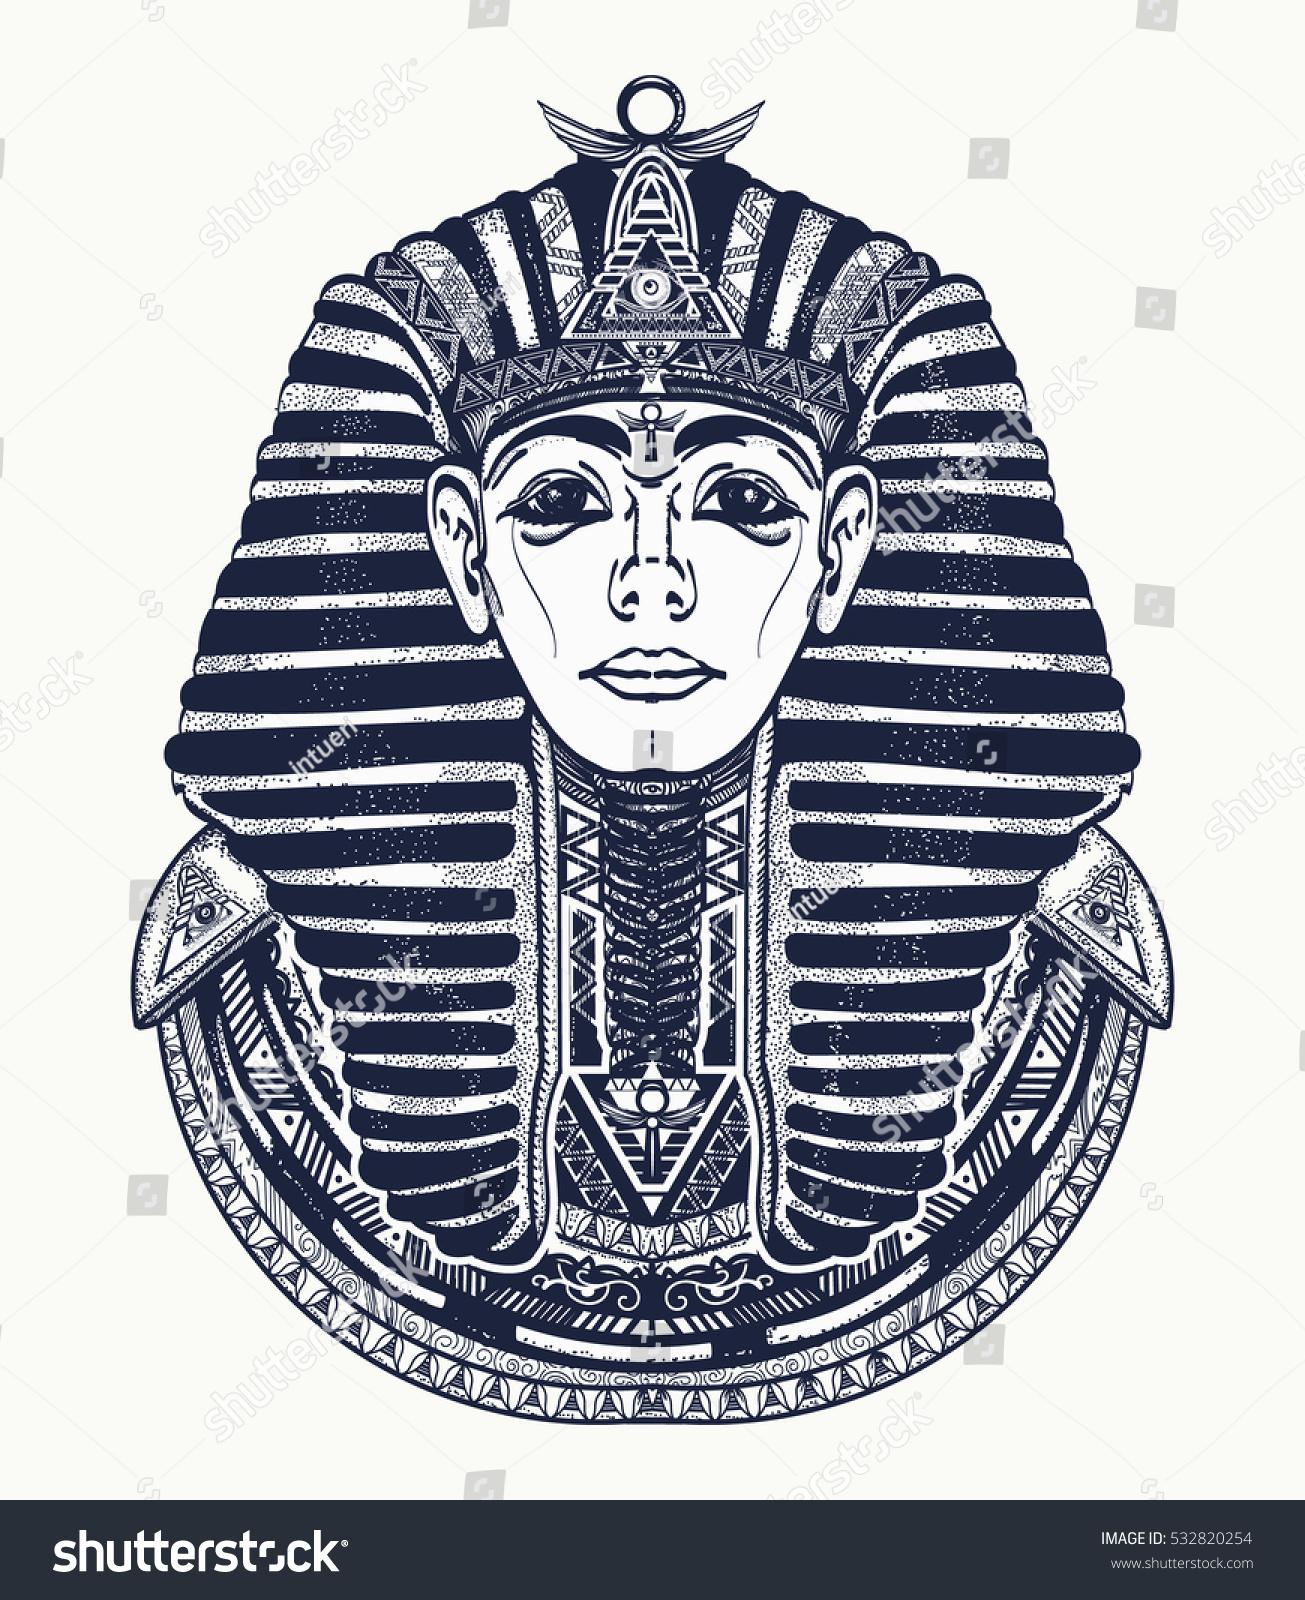 89549d01a Pharaoh tattoo art t-shirt design. Great king of ancient Egypt. Tutankhamen  mask ethnic style